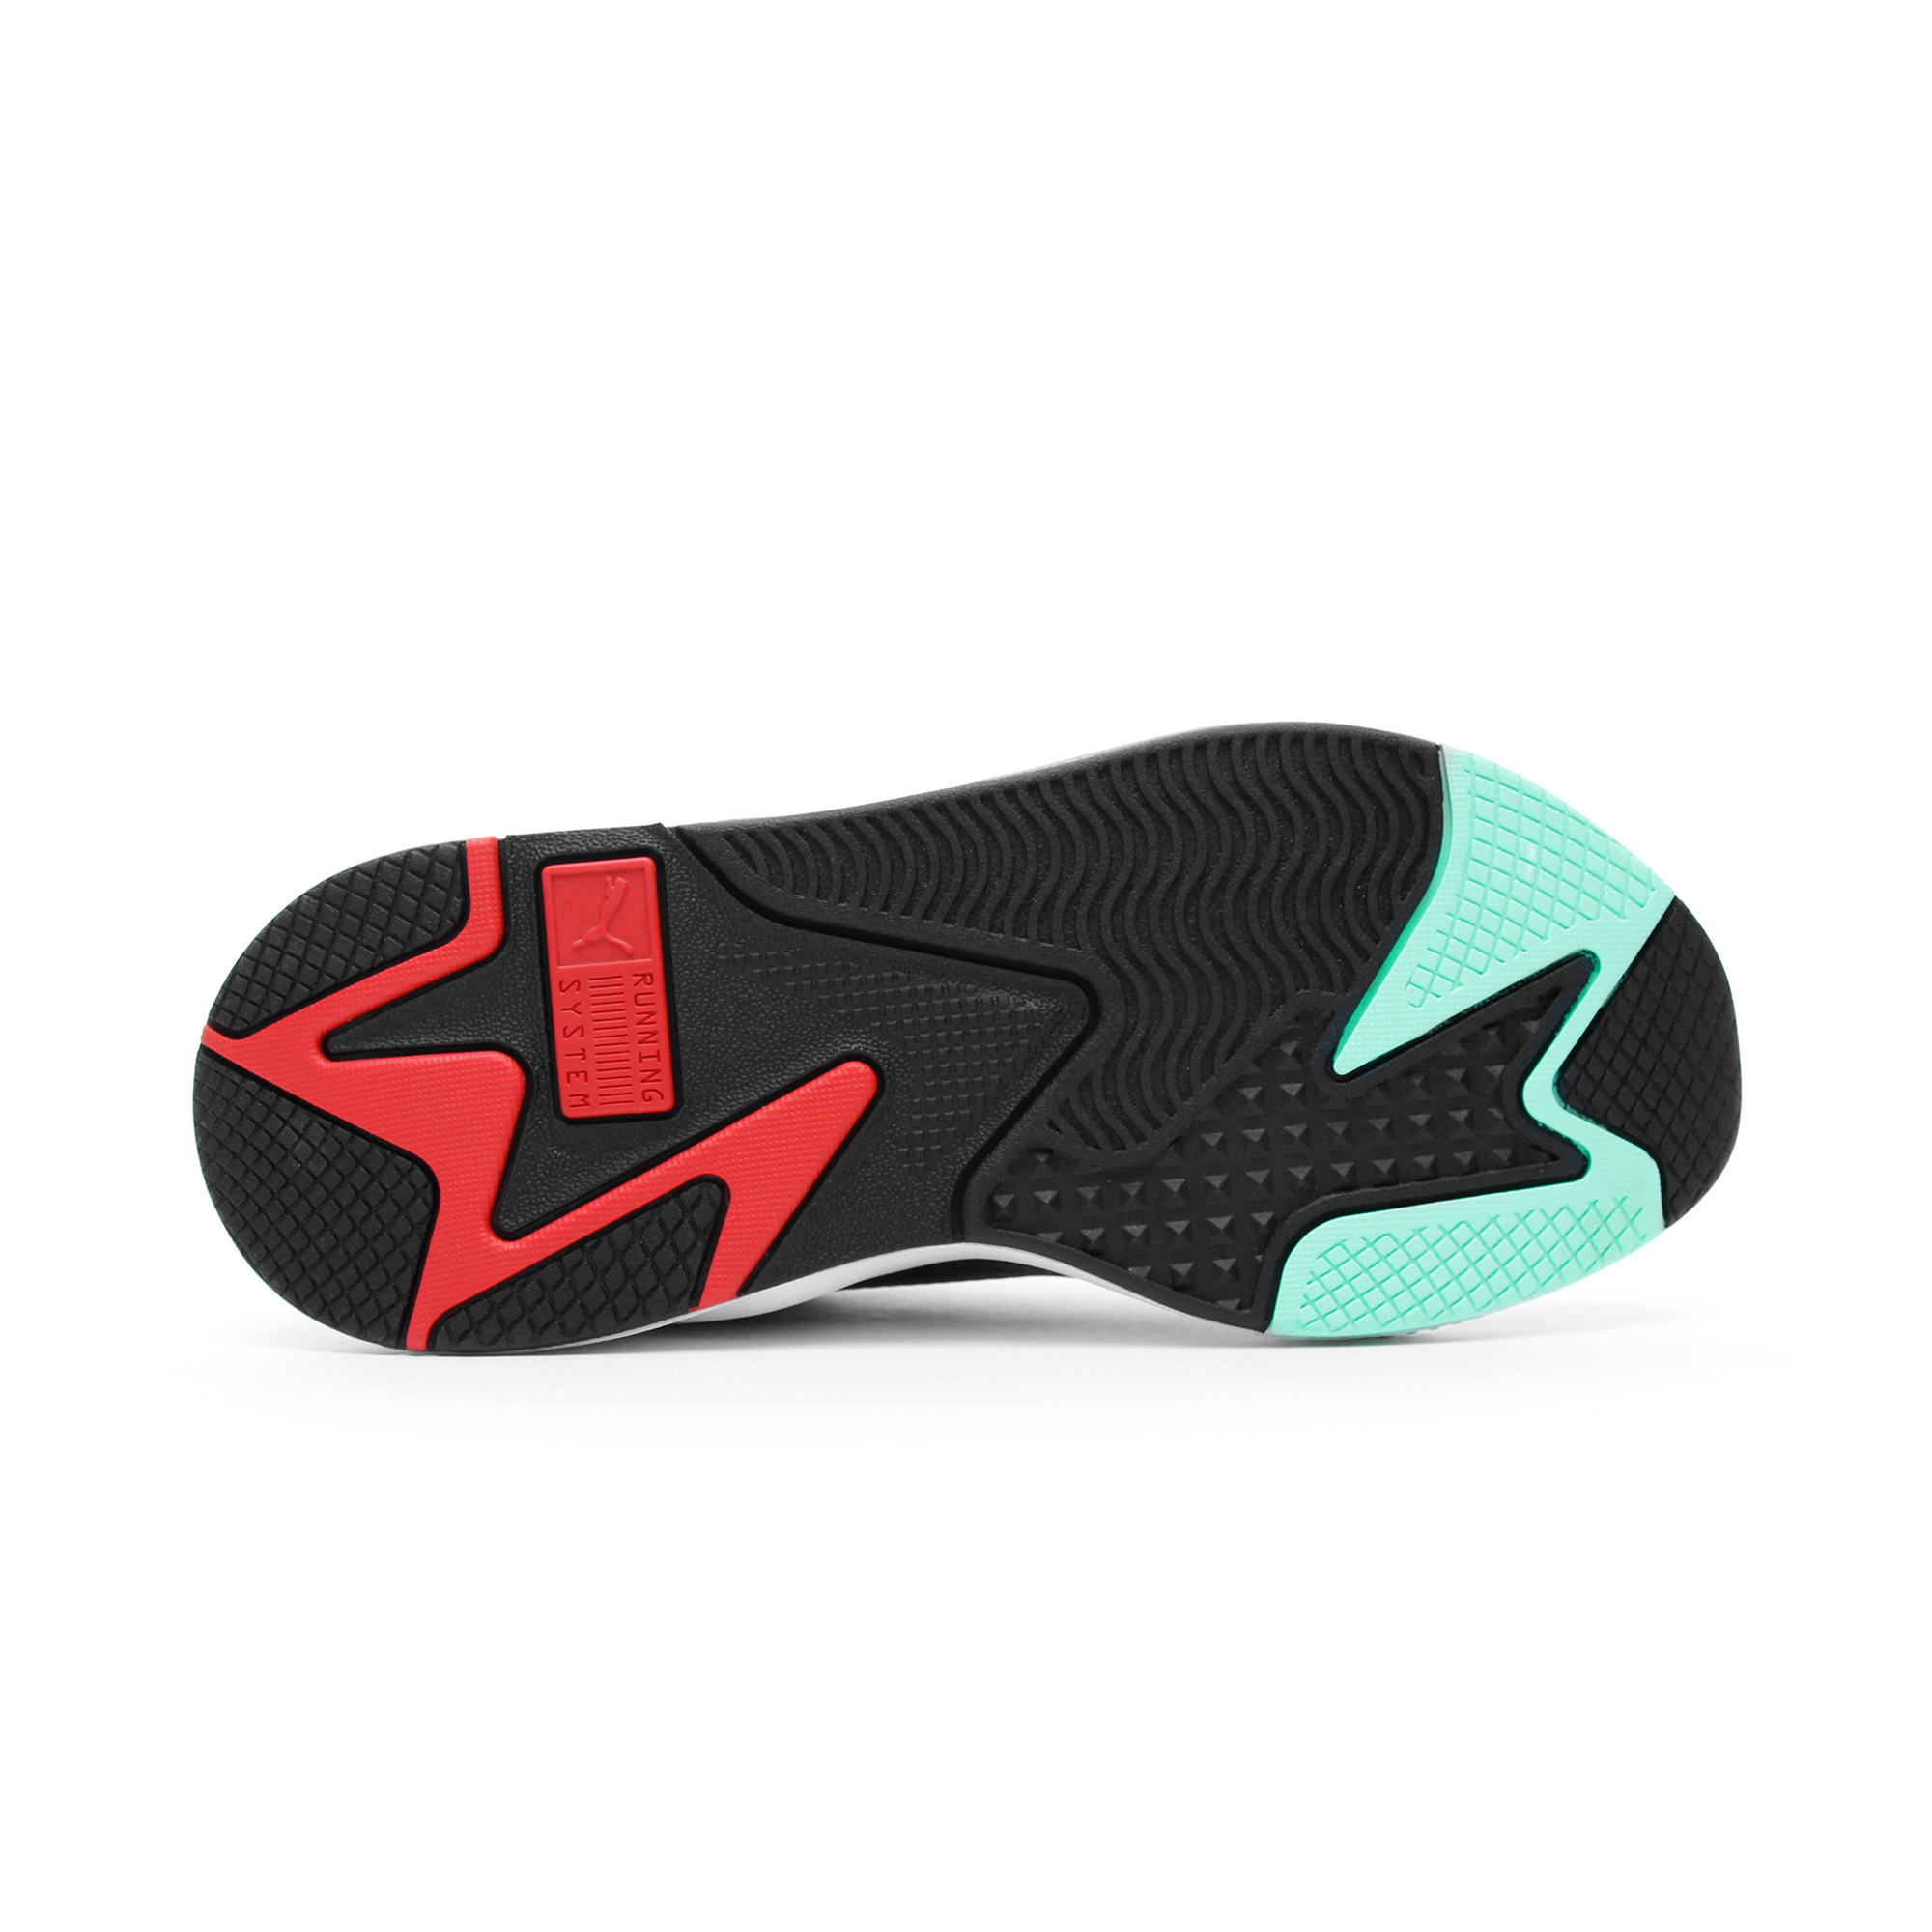 Puma RS-X Master Erkek Siyah Spor Ayakkabı